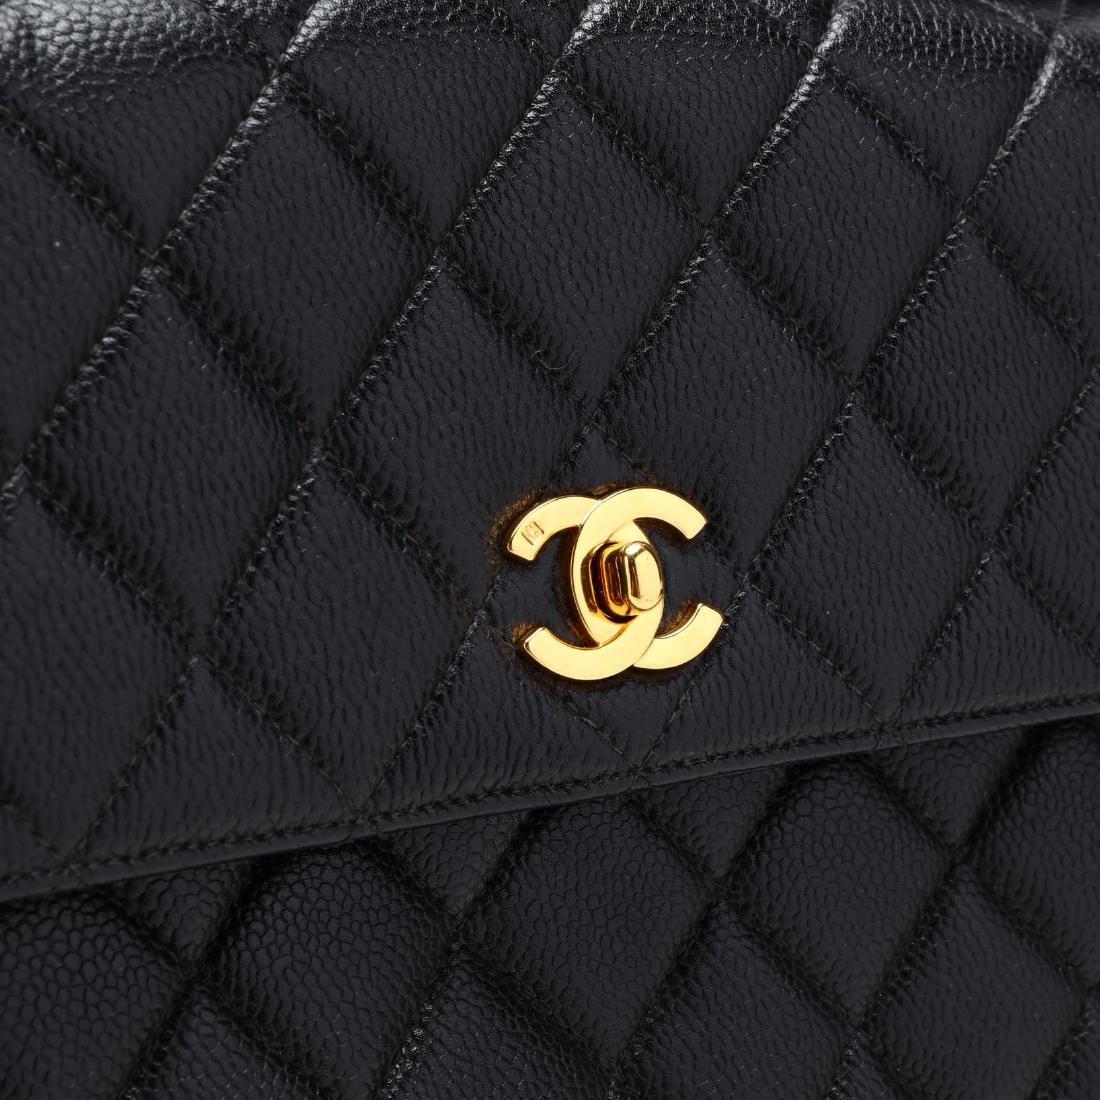 Caviar Leather Trapeze Flap Handbag, Chanel - 4